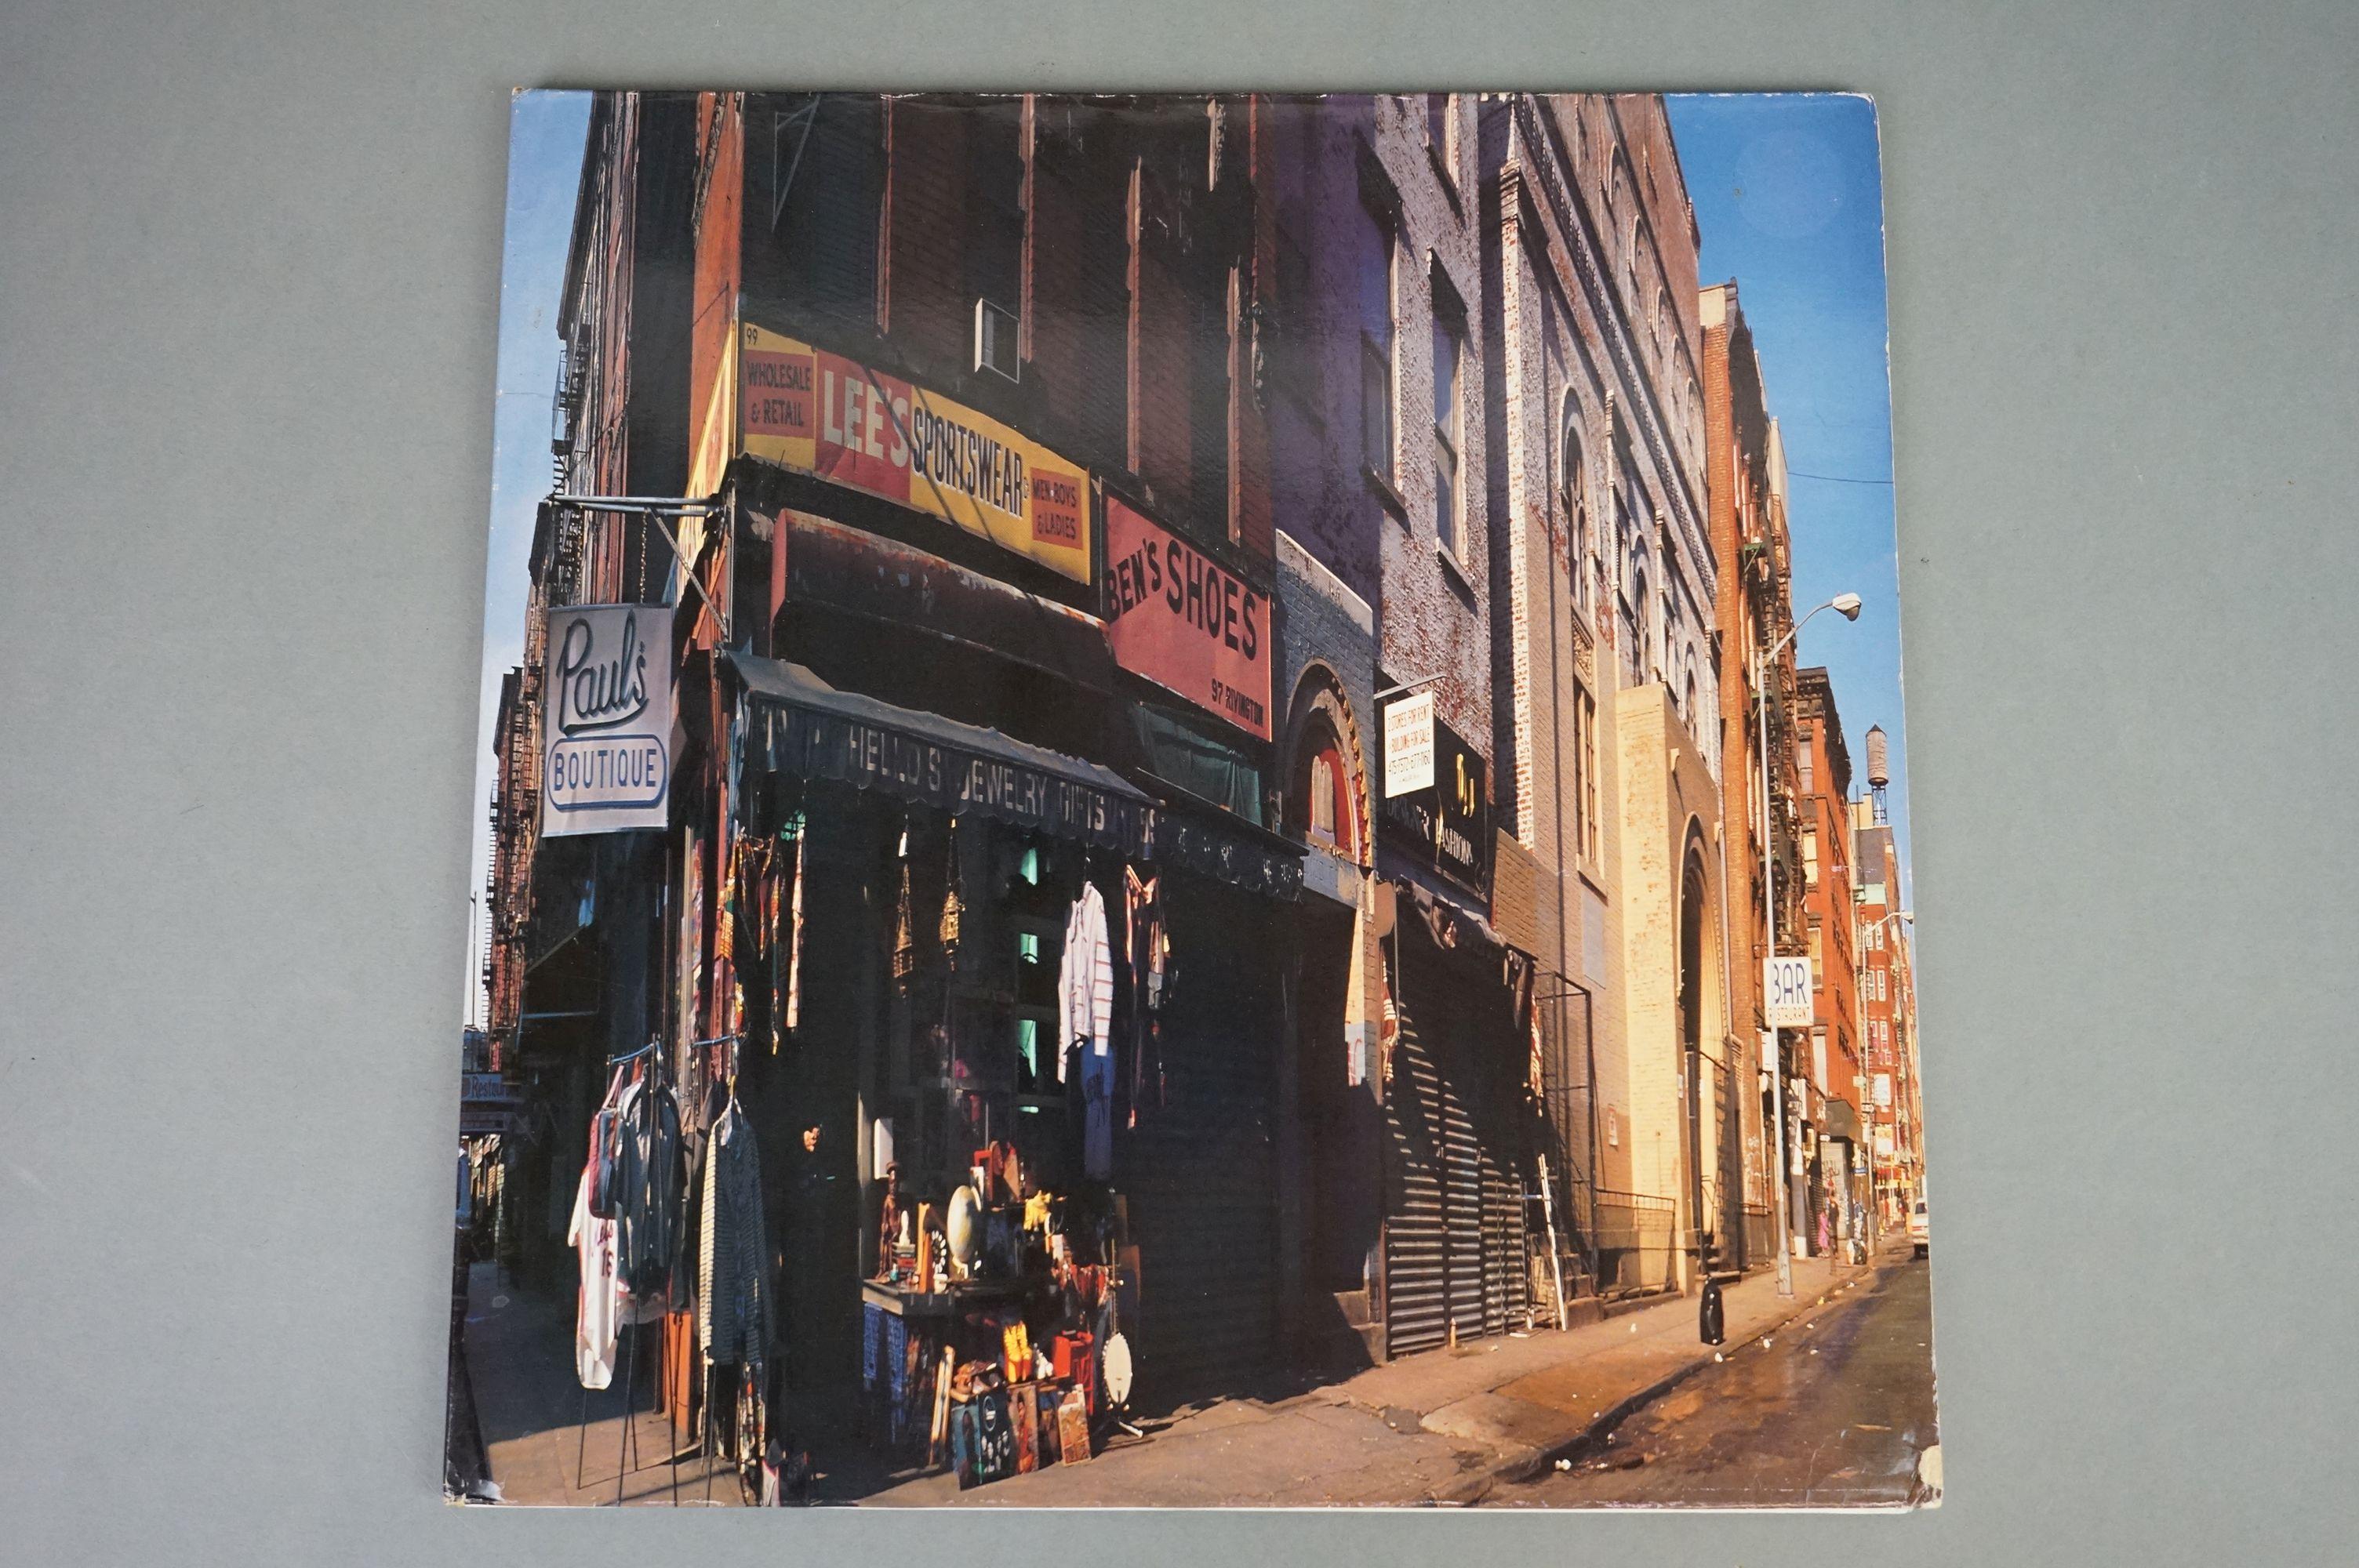 Vinyl - Beastie Boys Paul's Boutique LP on Capitol UK 077779174317 UKEST2102 with 'promotional